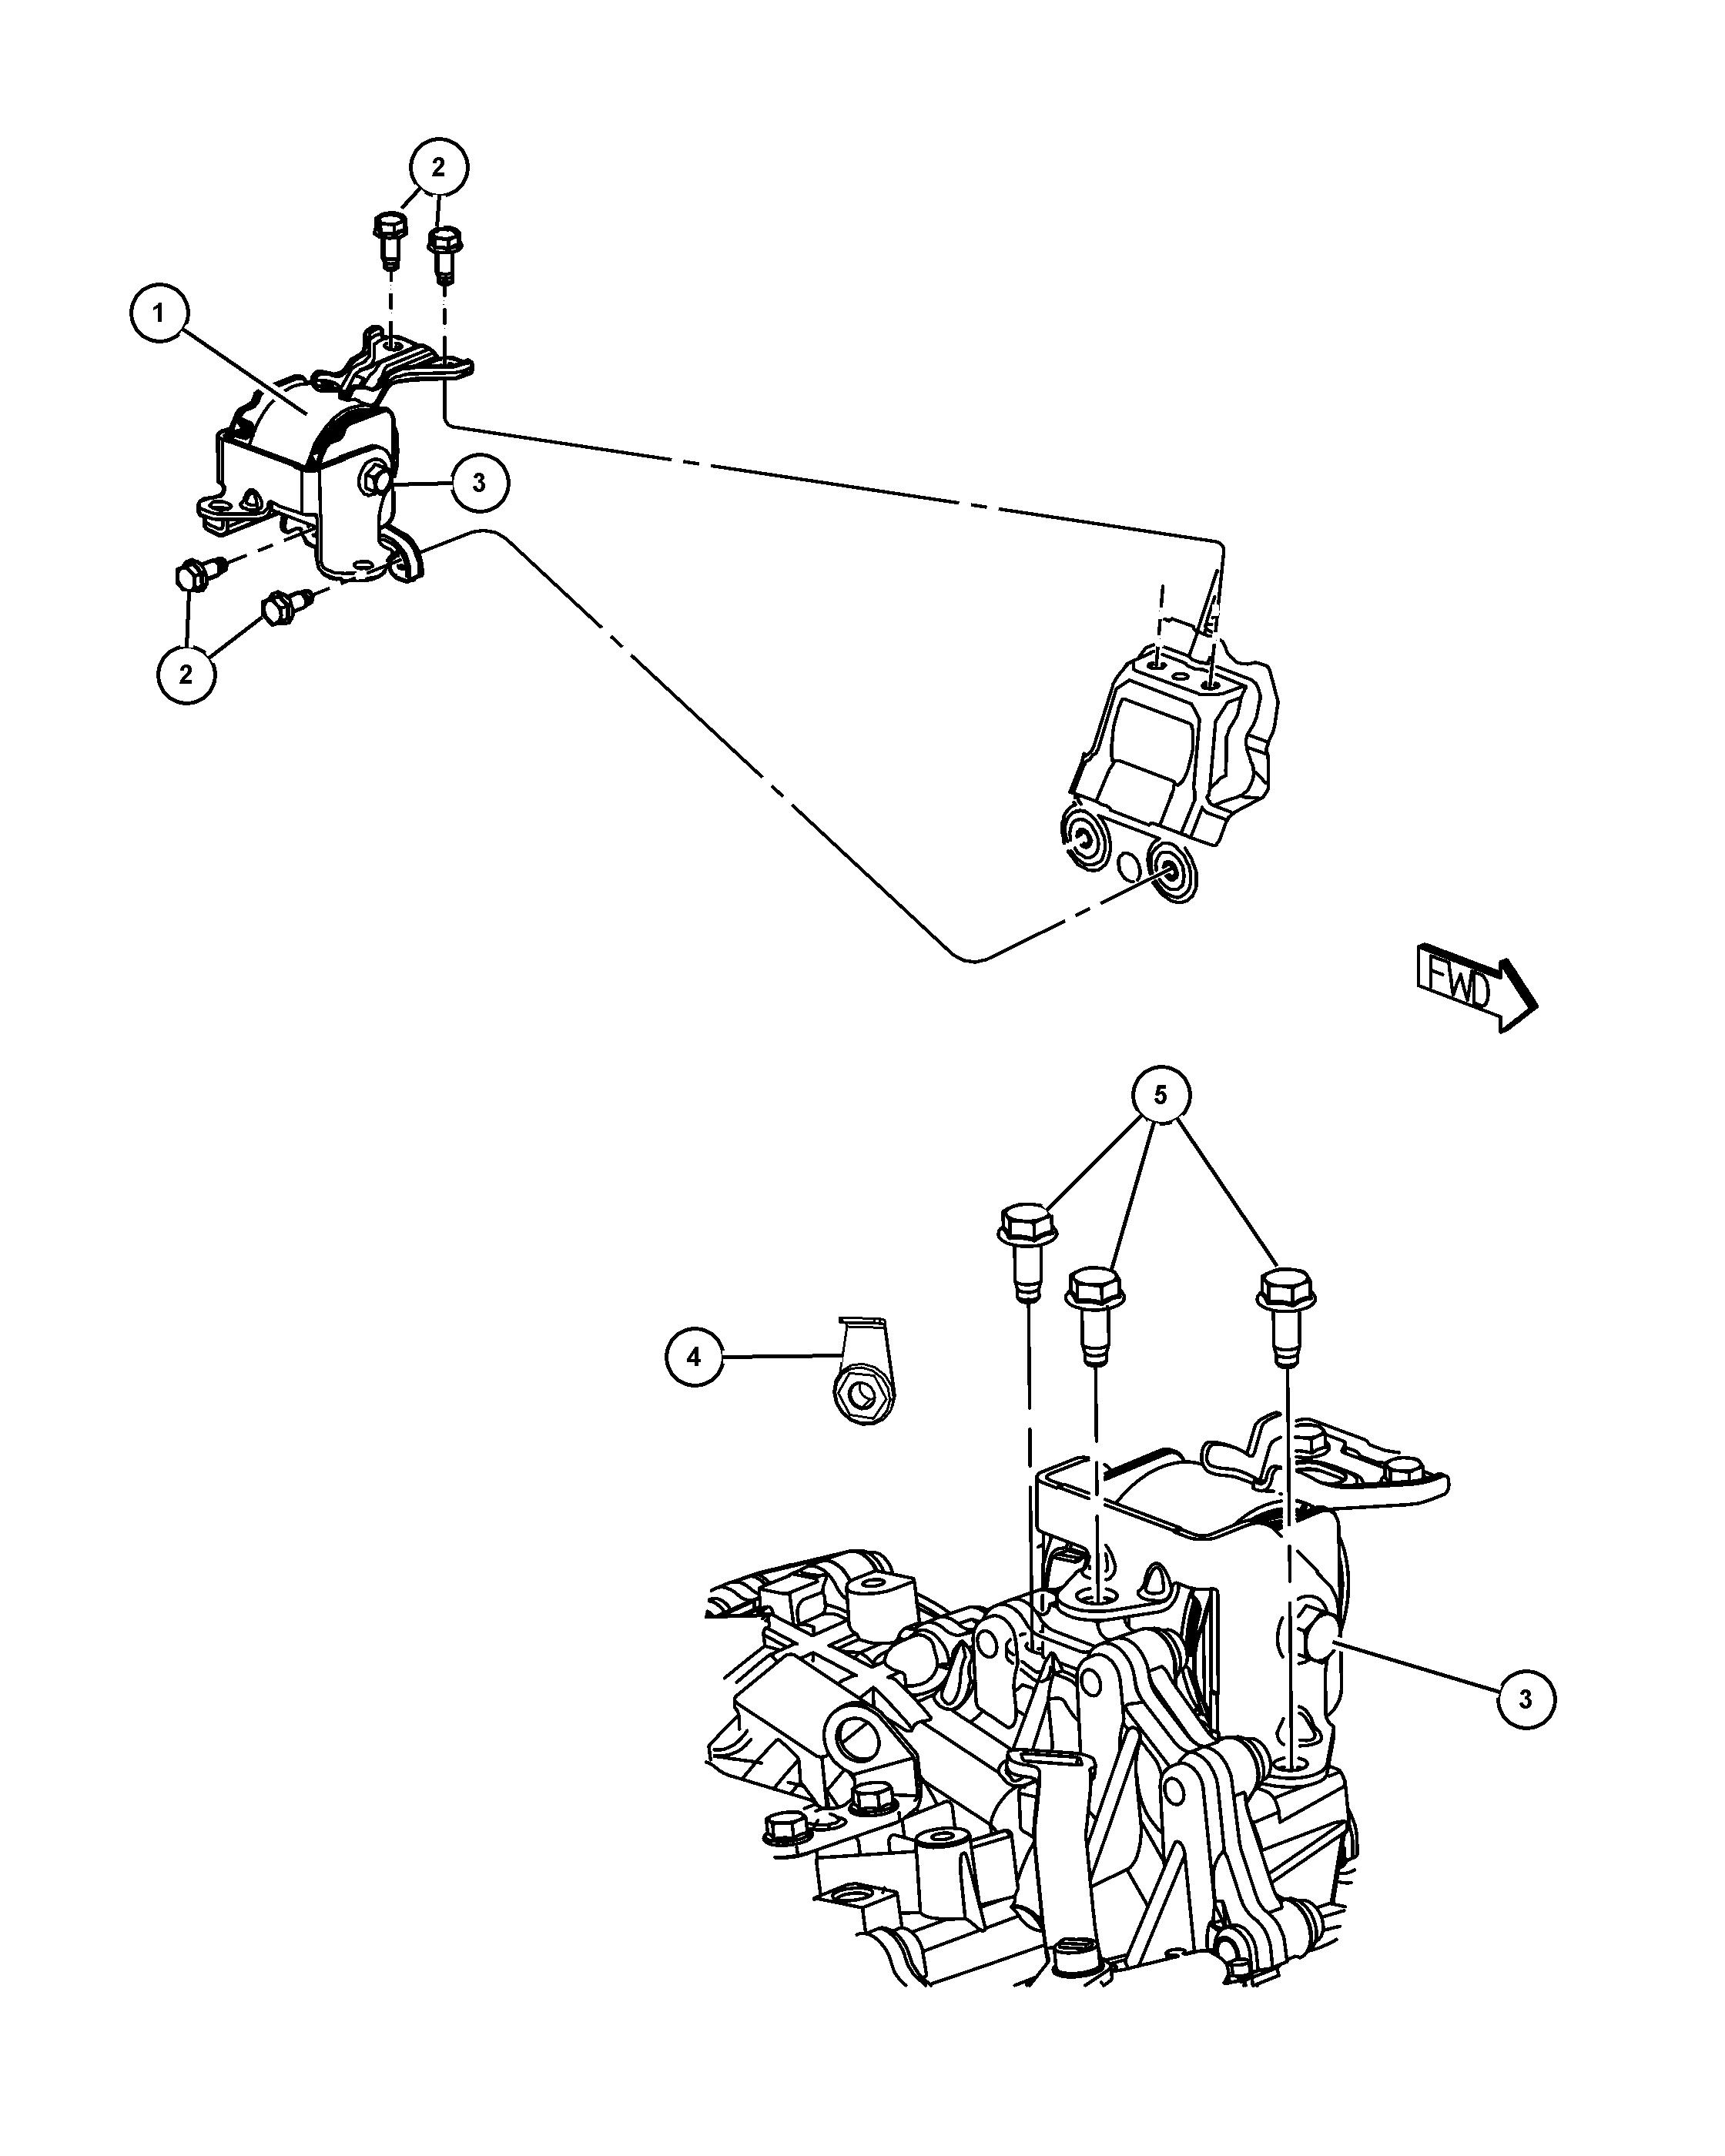 kenwood car radio wiring diagram jeep grand cherokee wj upgrading jeep mk diagram e2 wiring diagram  jeep mk diagram e2 wiring diagram